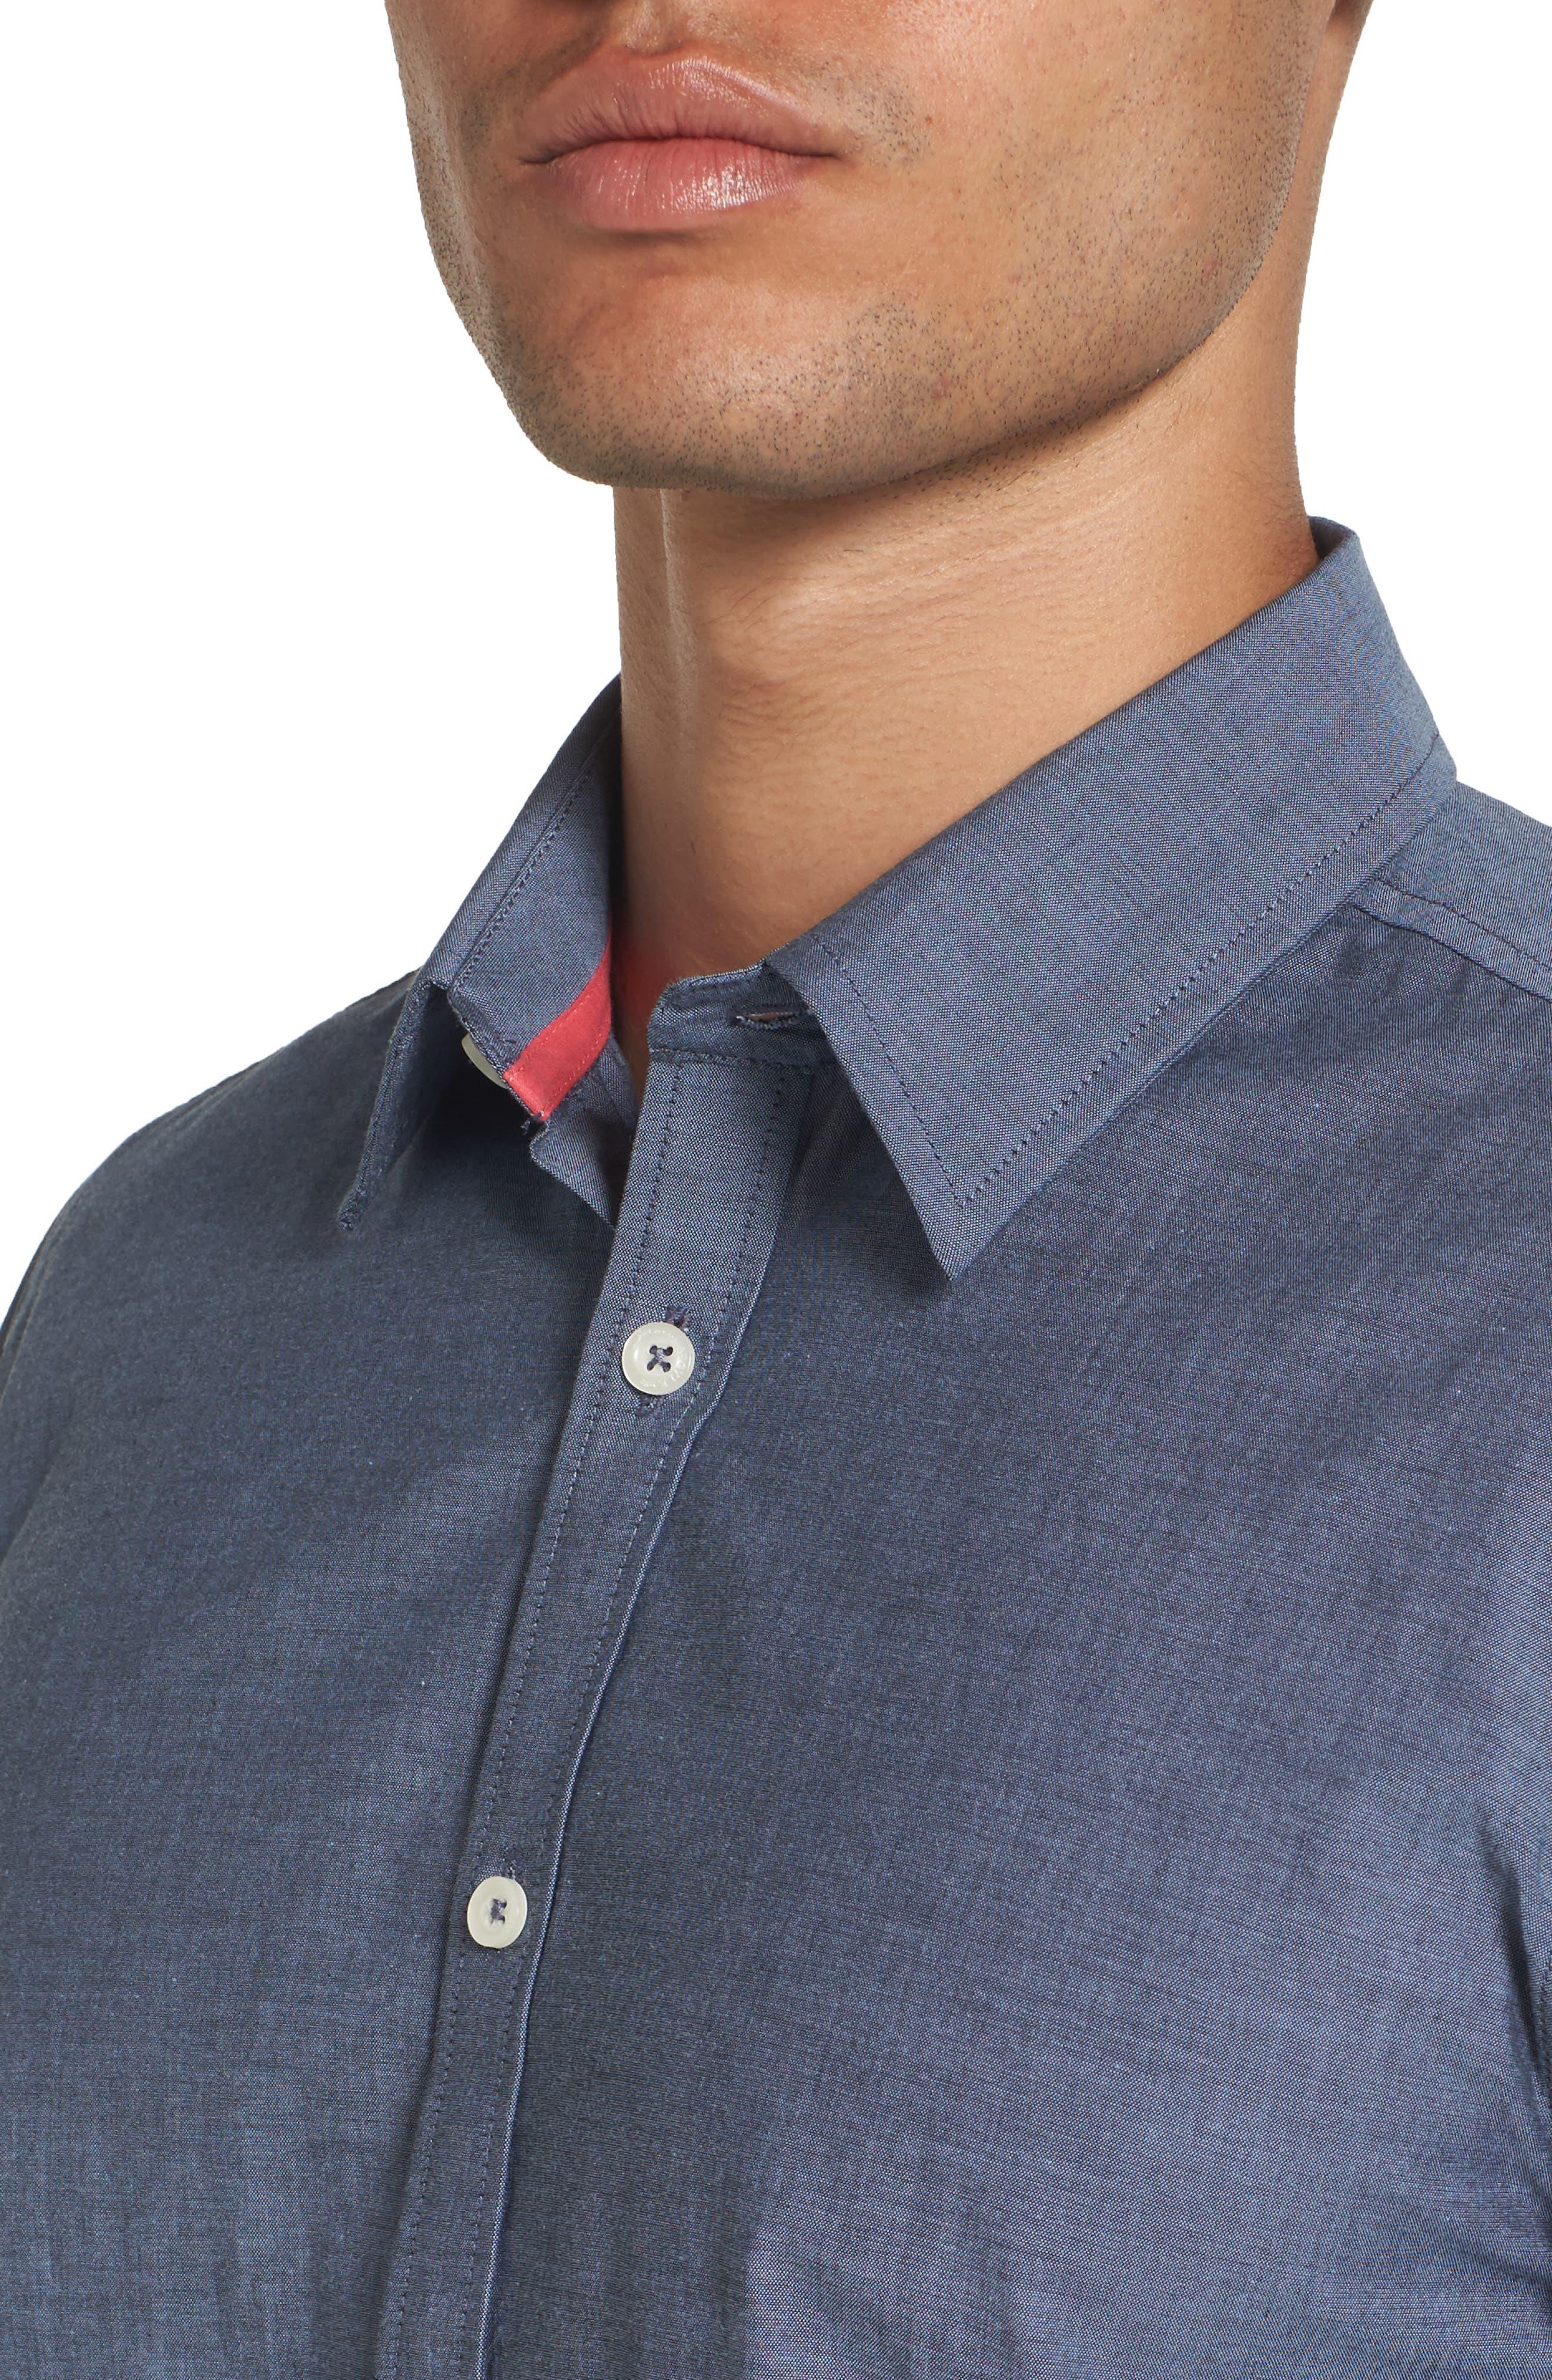 Fitted Sport Shirt,                             Alternate thumbnail 4, color,                             Medium Blue